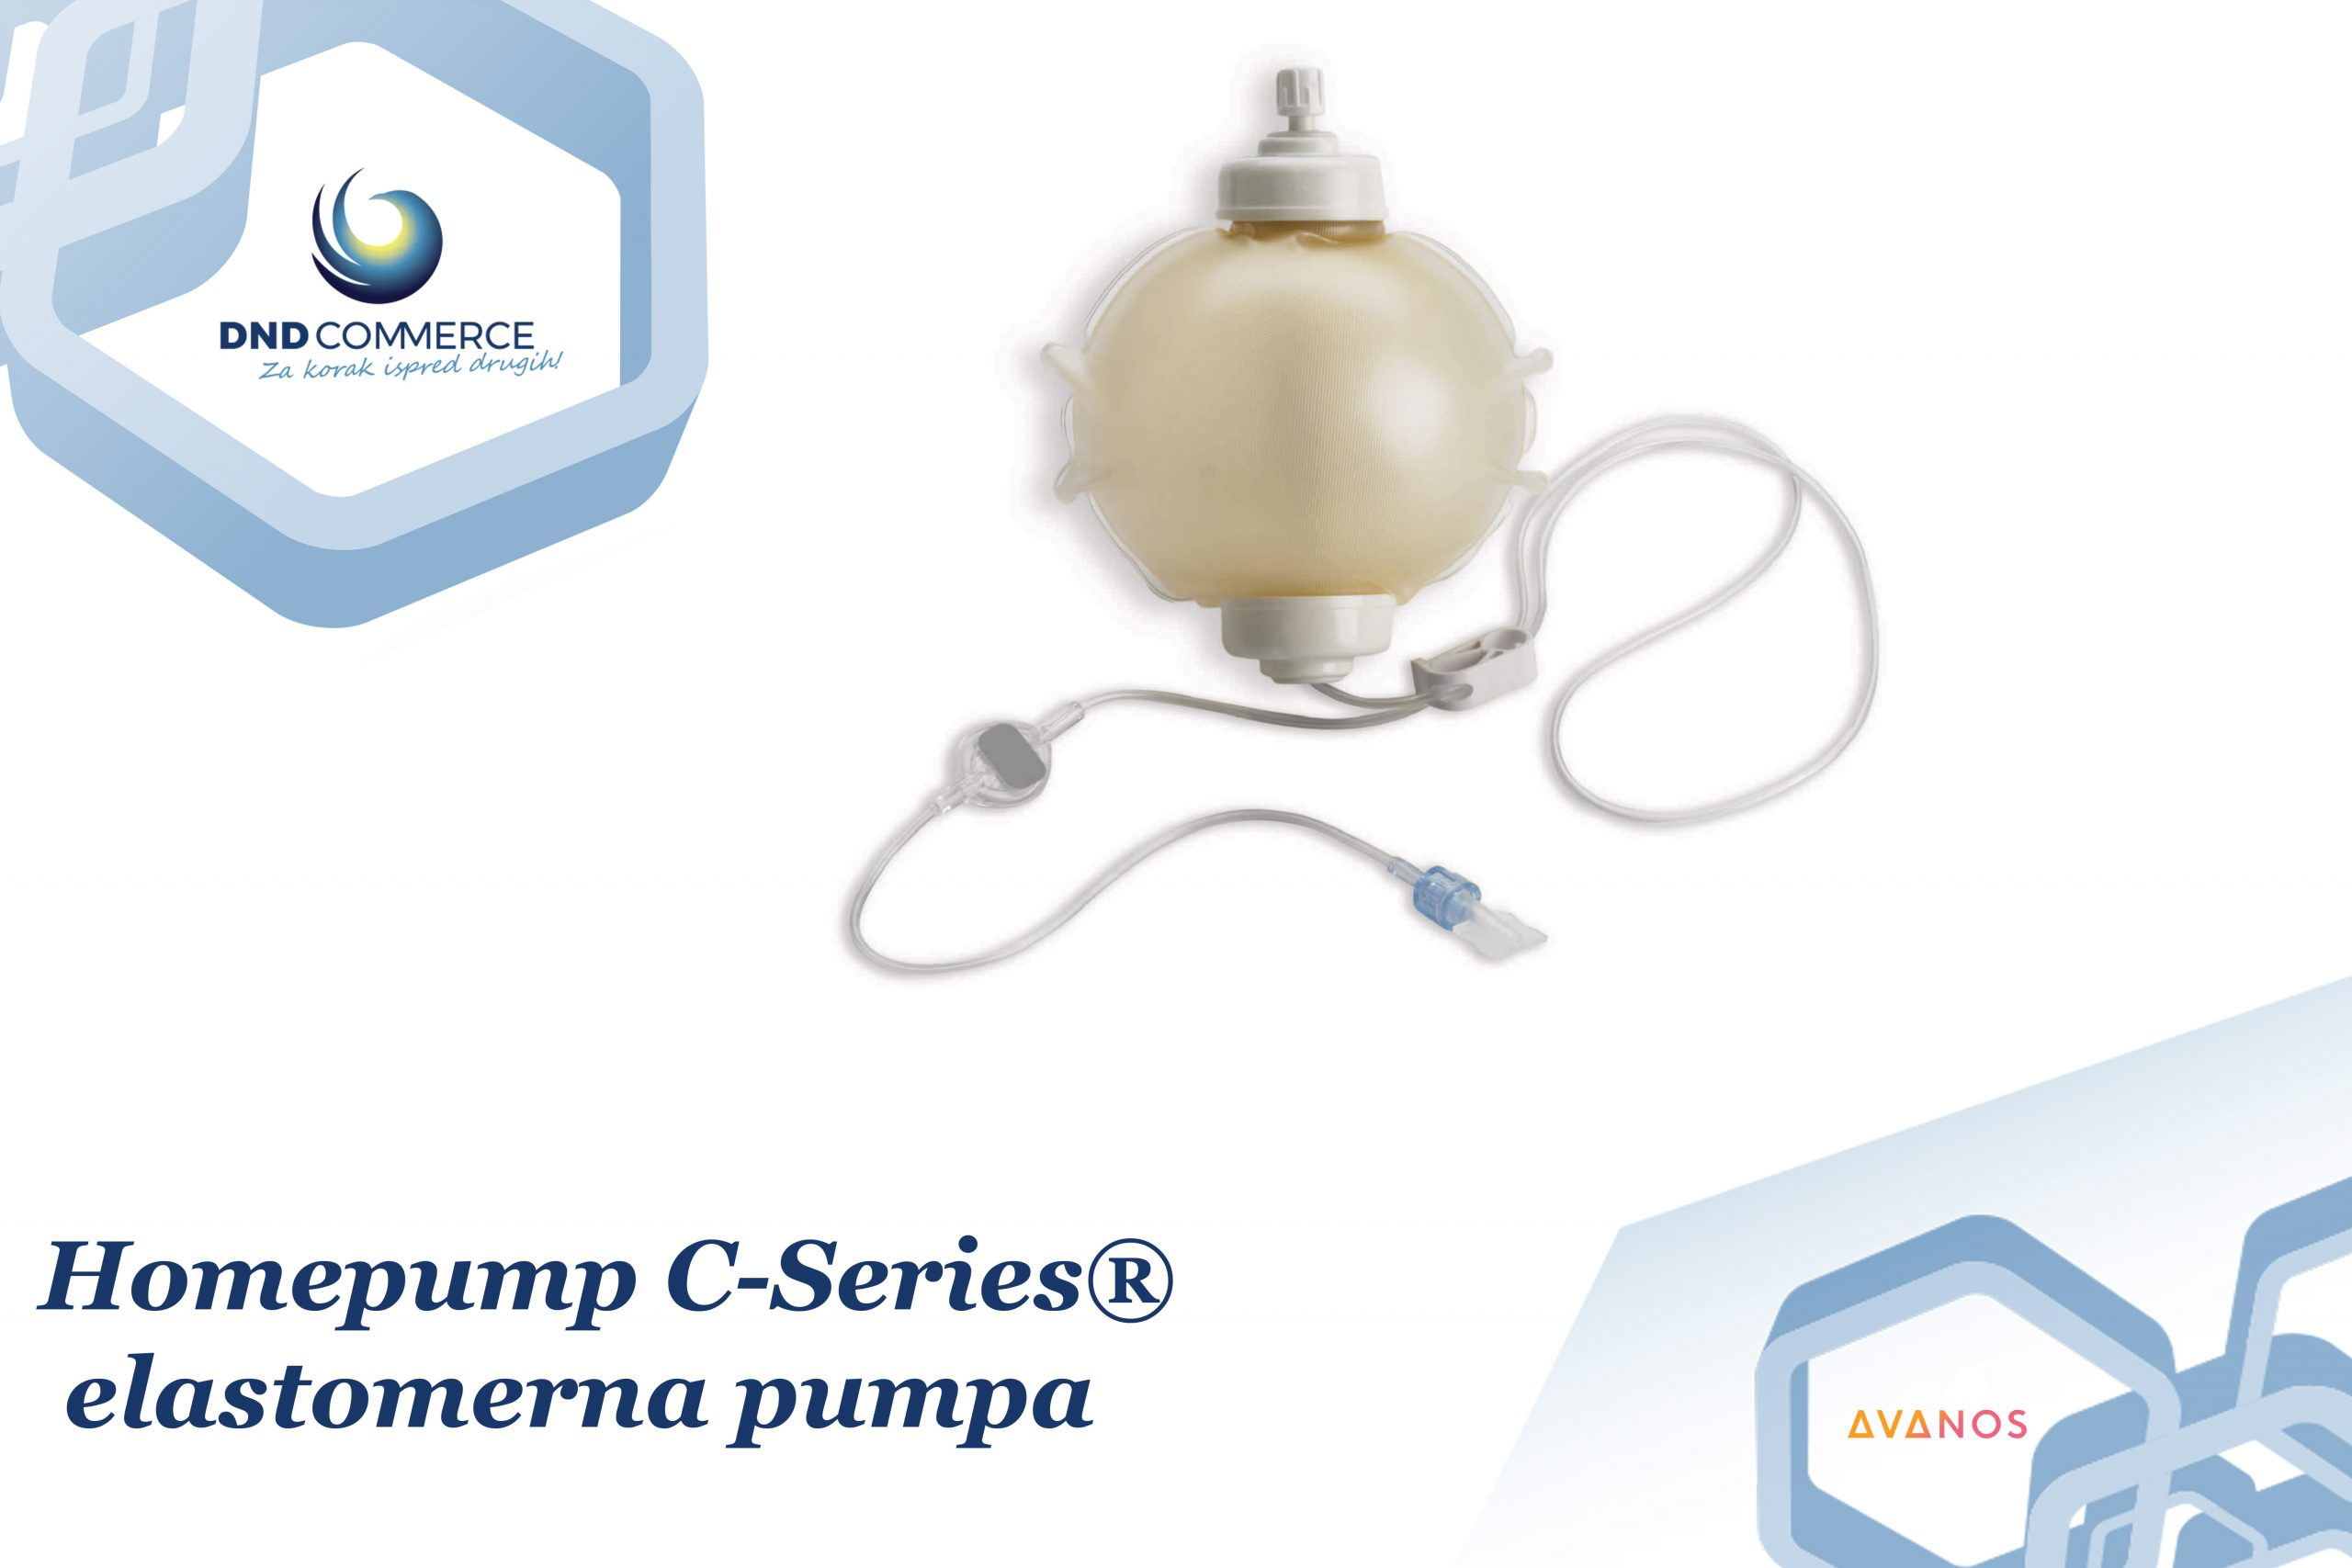 You are currently viewing Homepump C-Series® elastomerna pumpa – Avanos company